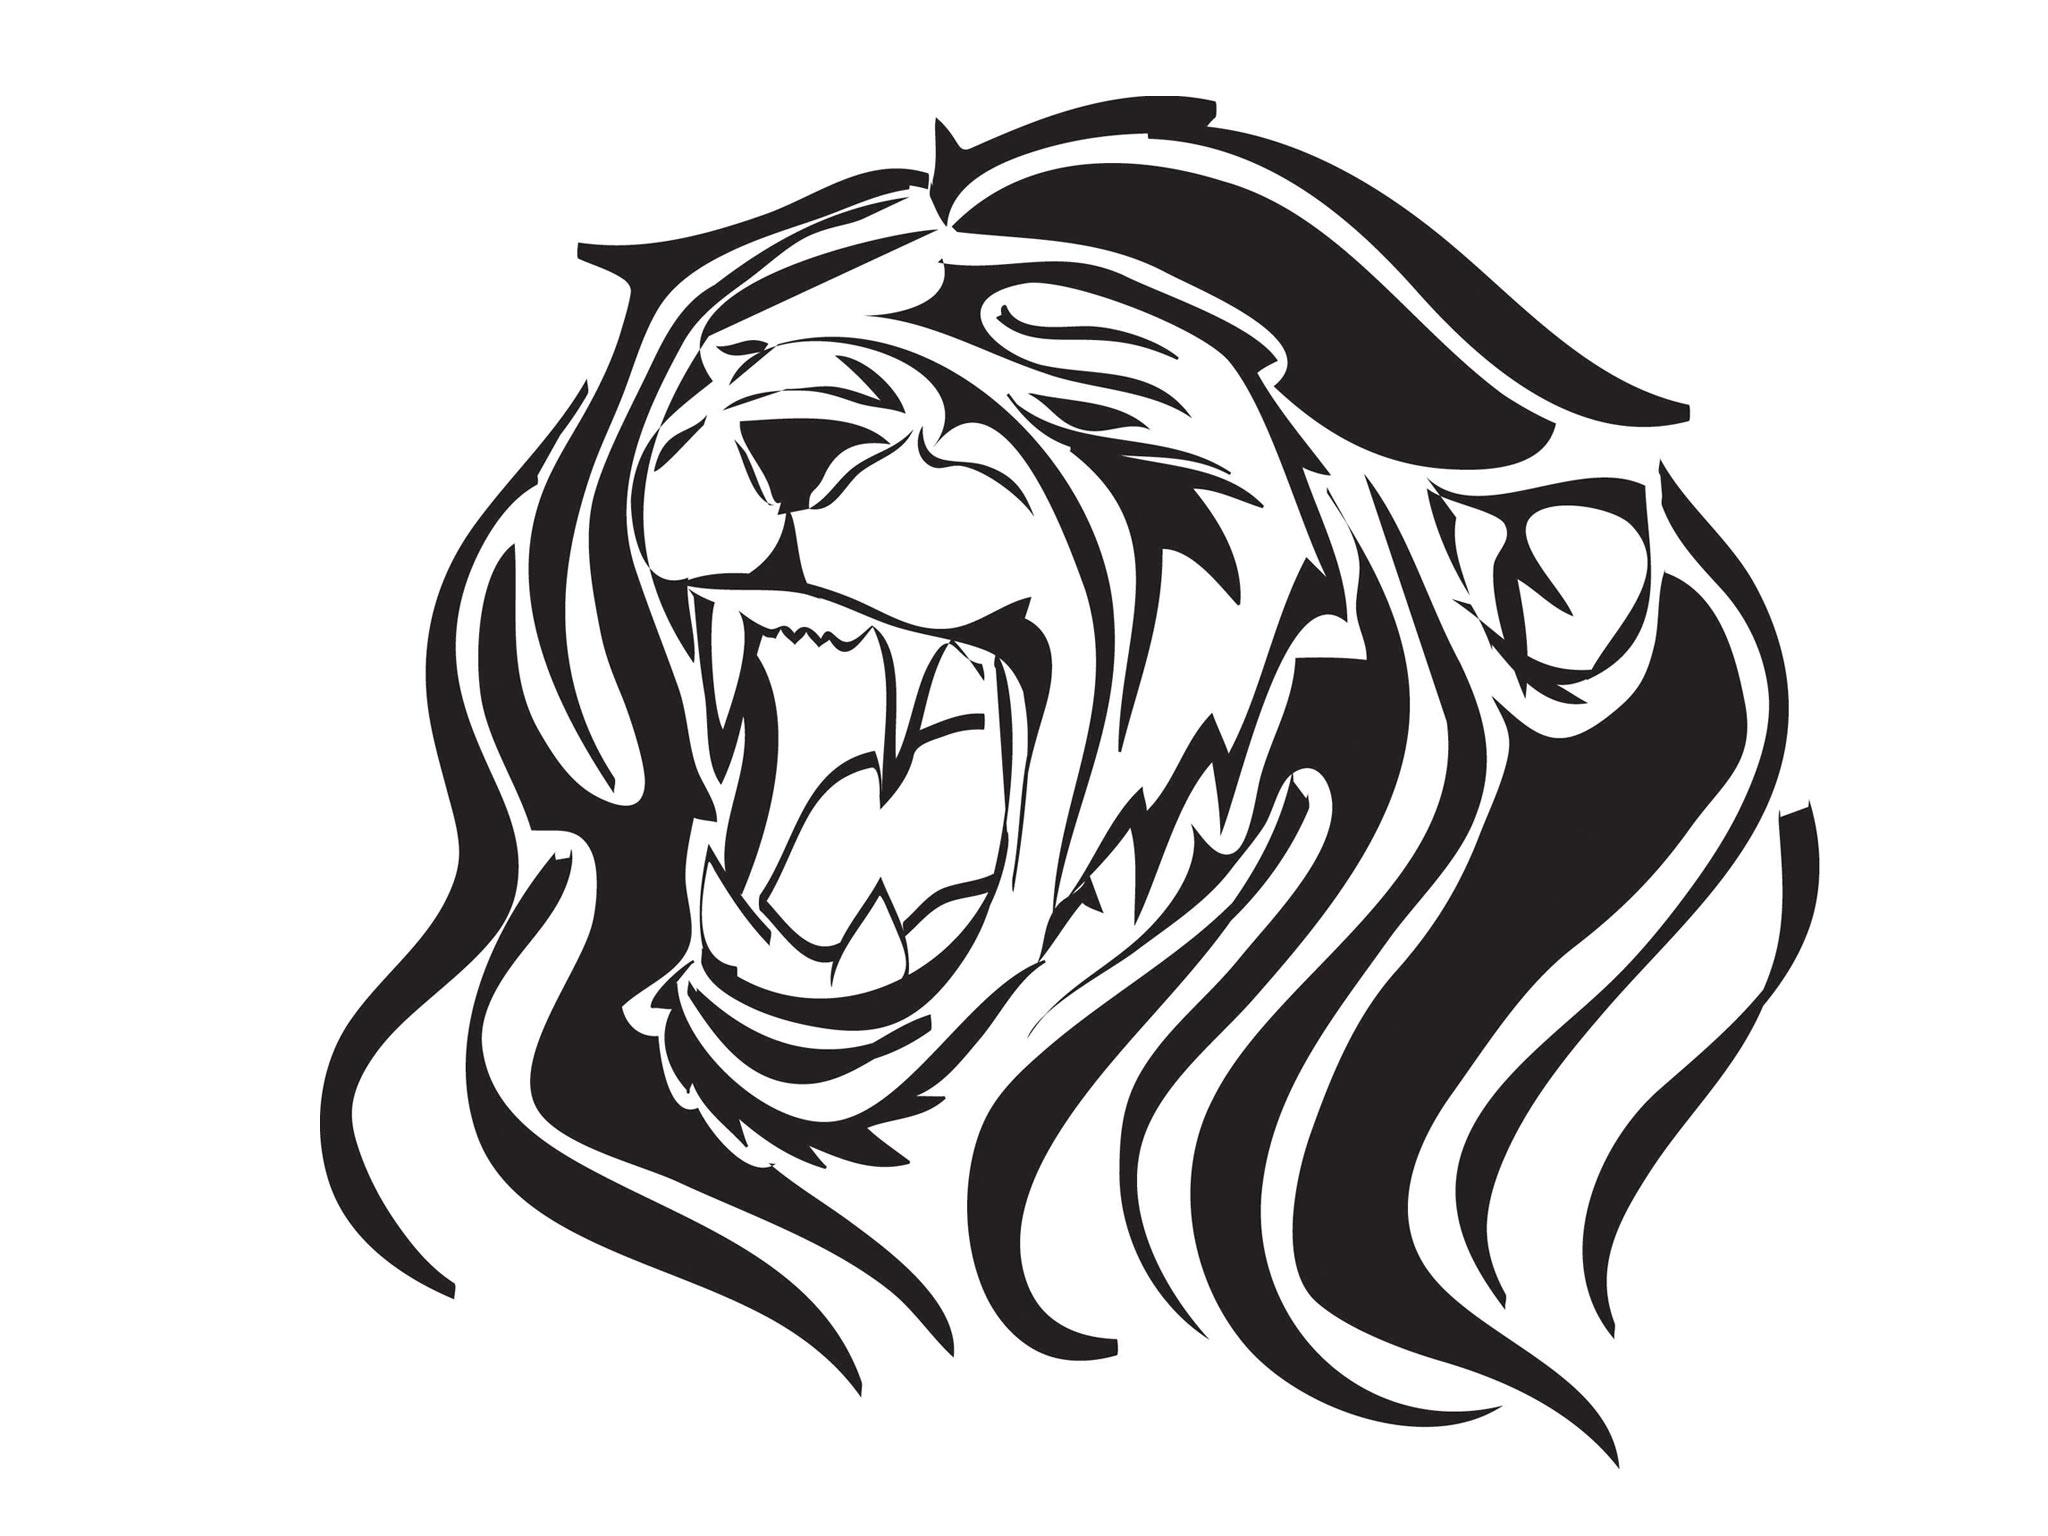 Free Designs Roaring Lion Tattoo Wallpaper ClipArt